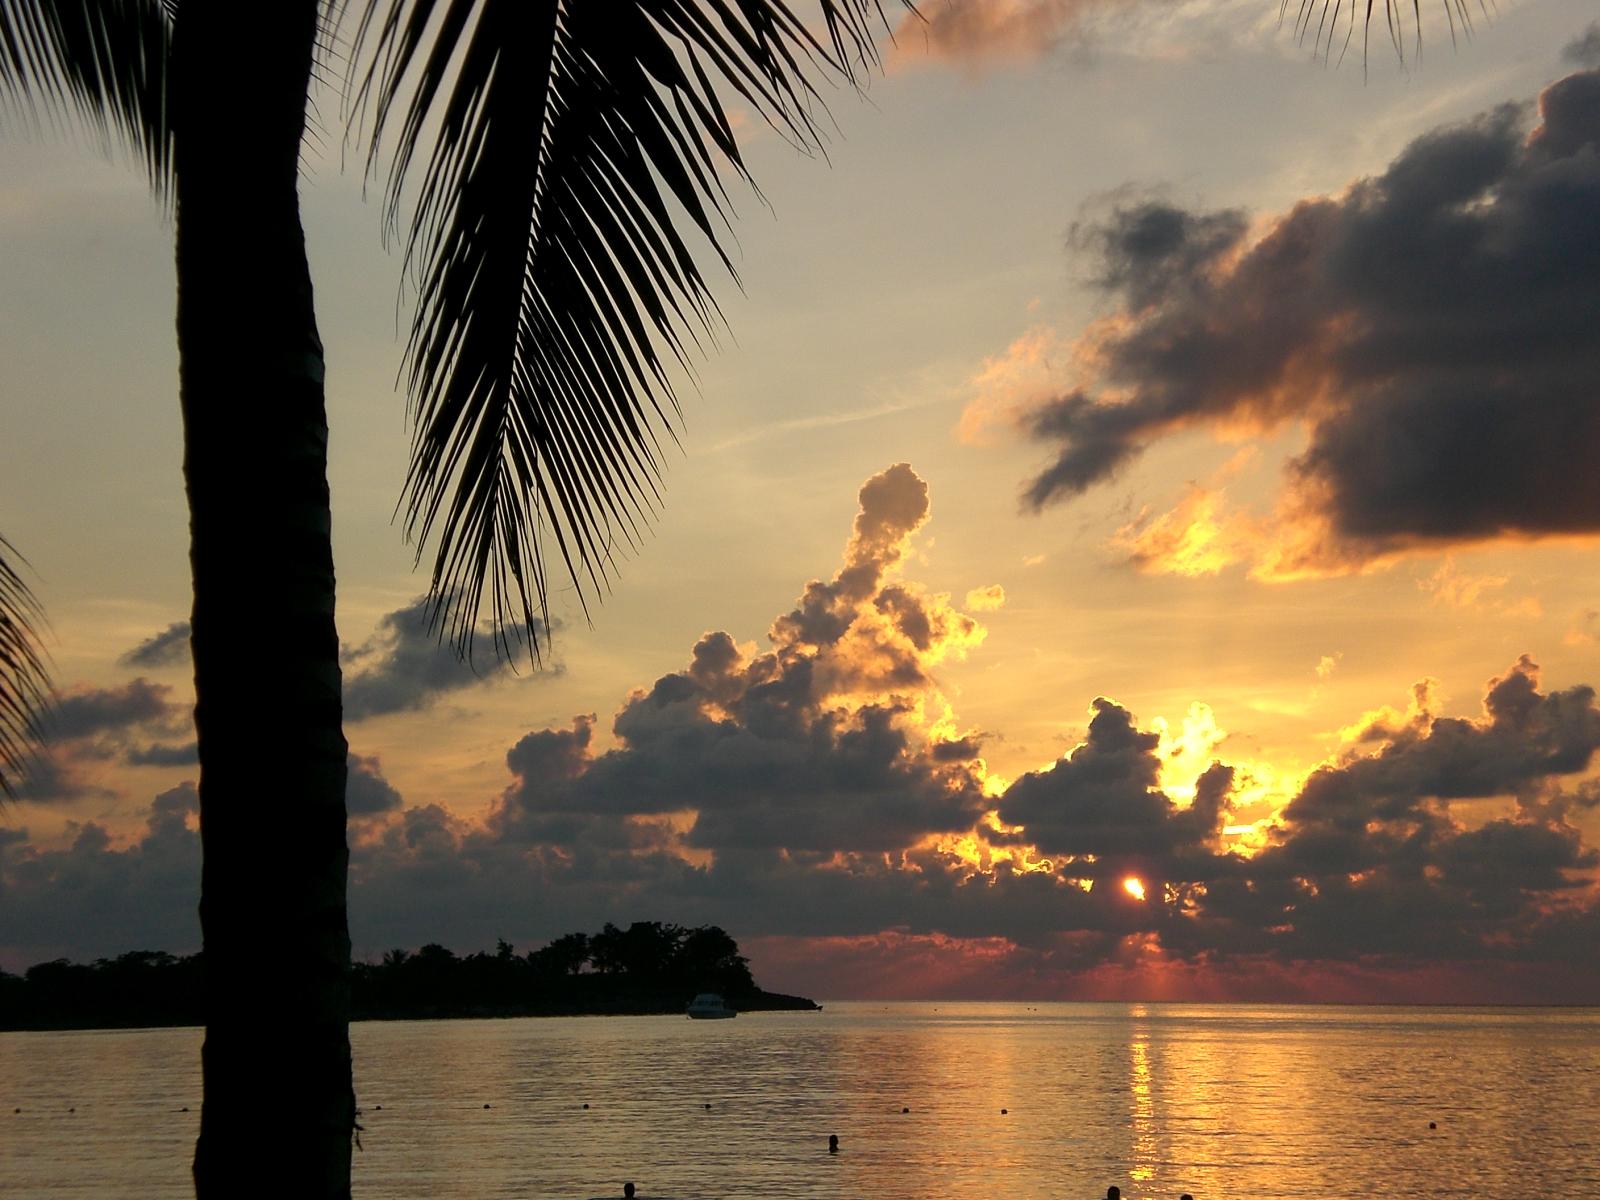 jamaica-sunset-1383064